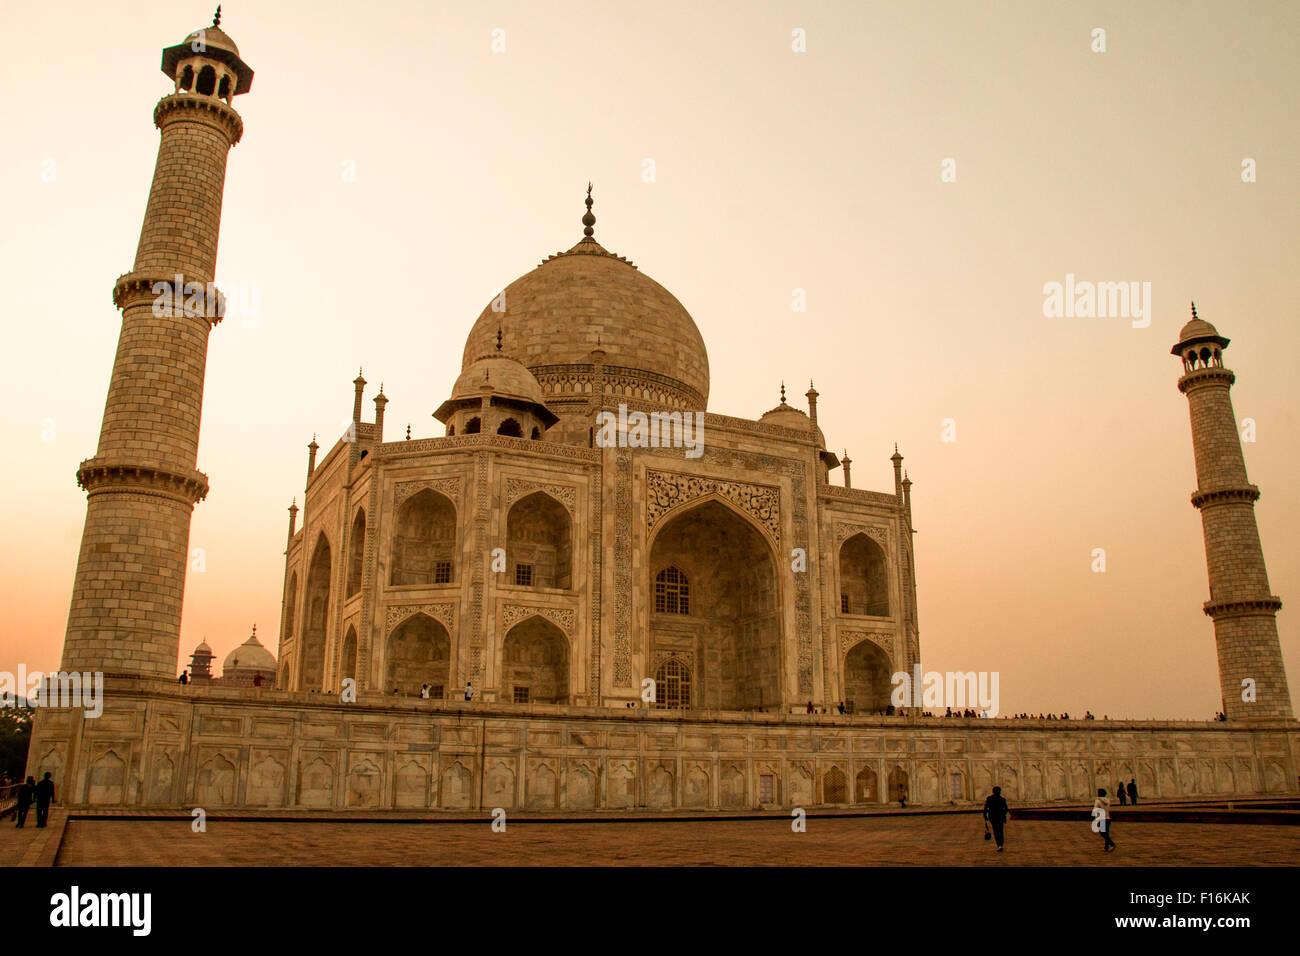 Taj Mahal al tramonto, Agra, India. Immagini Stock